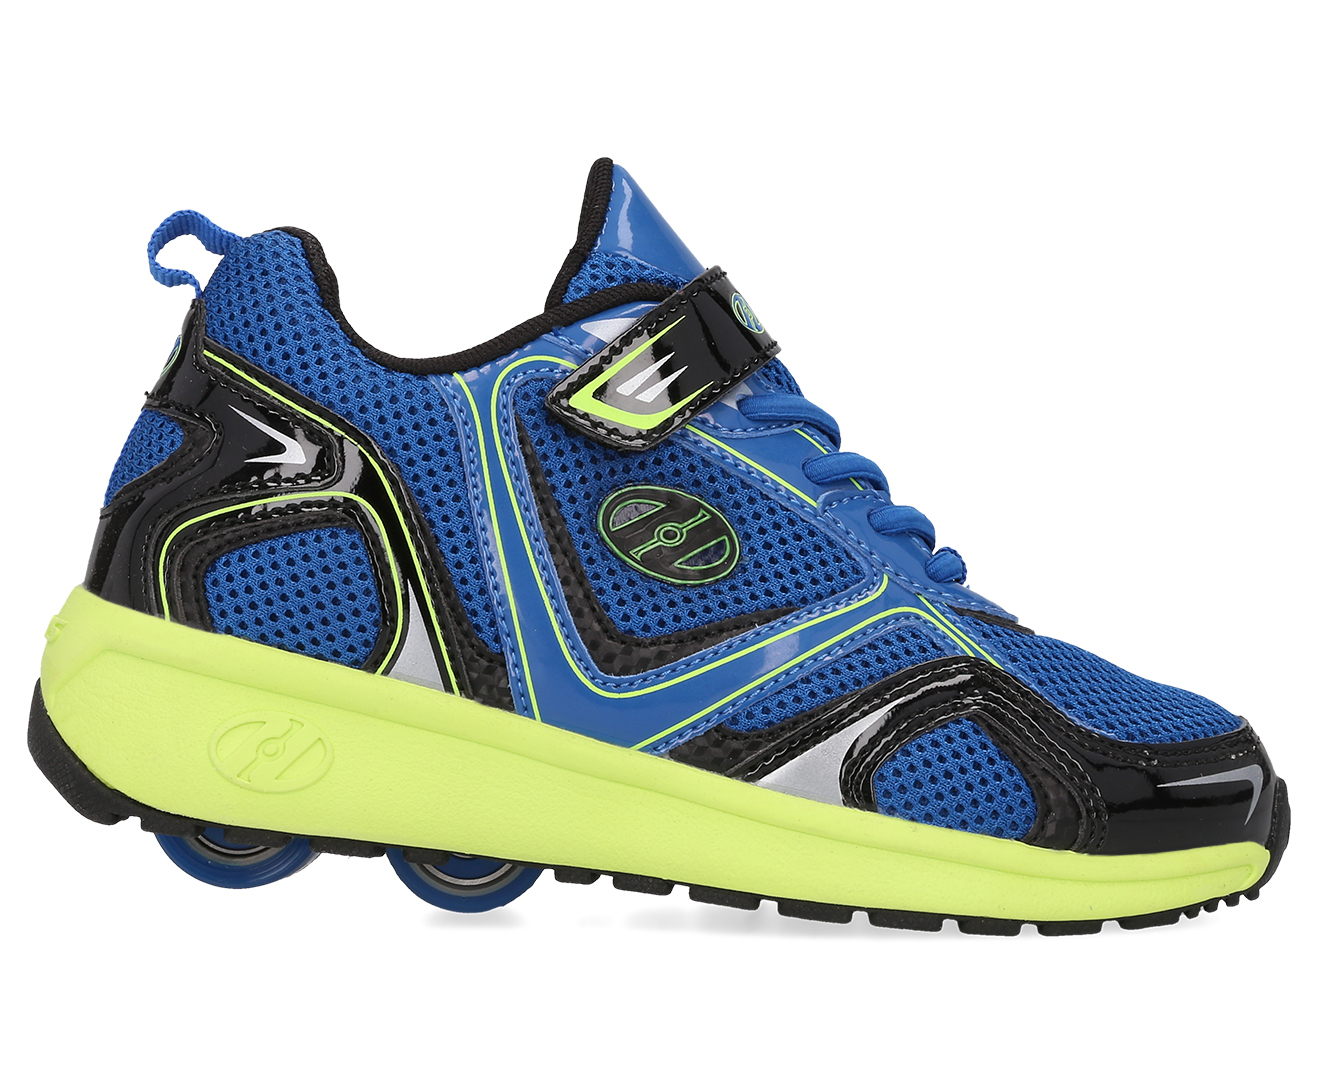 c930506733346 Heelys Kids' Rise X2 Roller Shoe - Blue/Yellow/Black